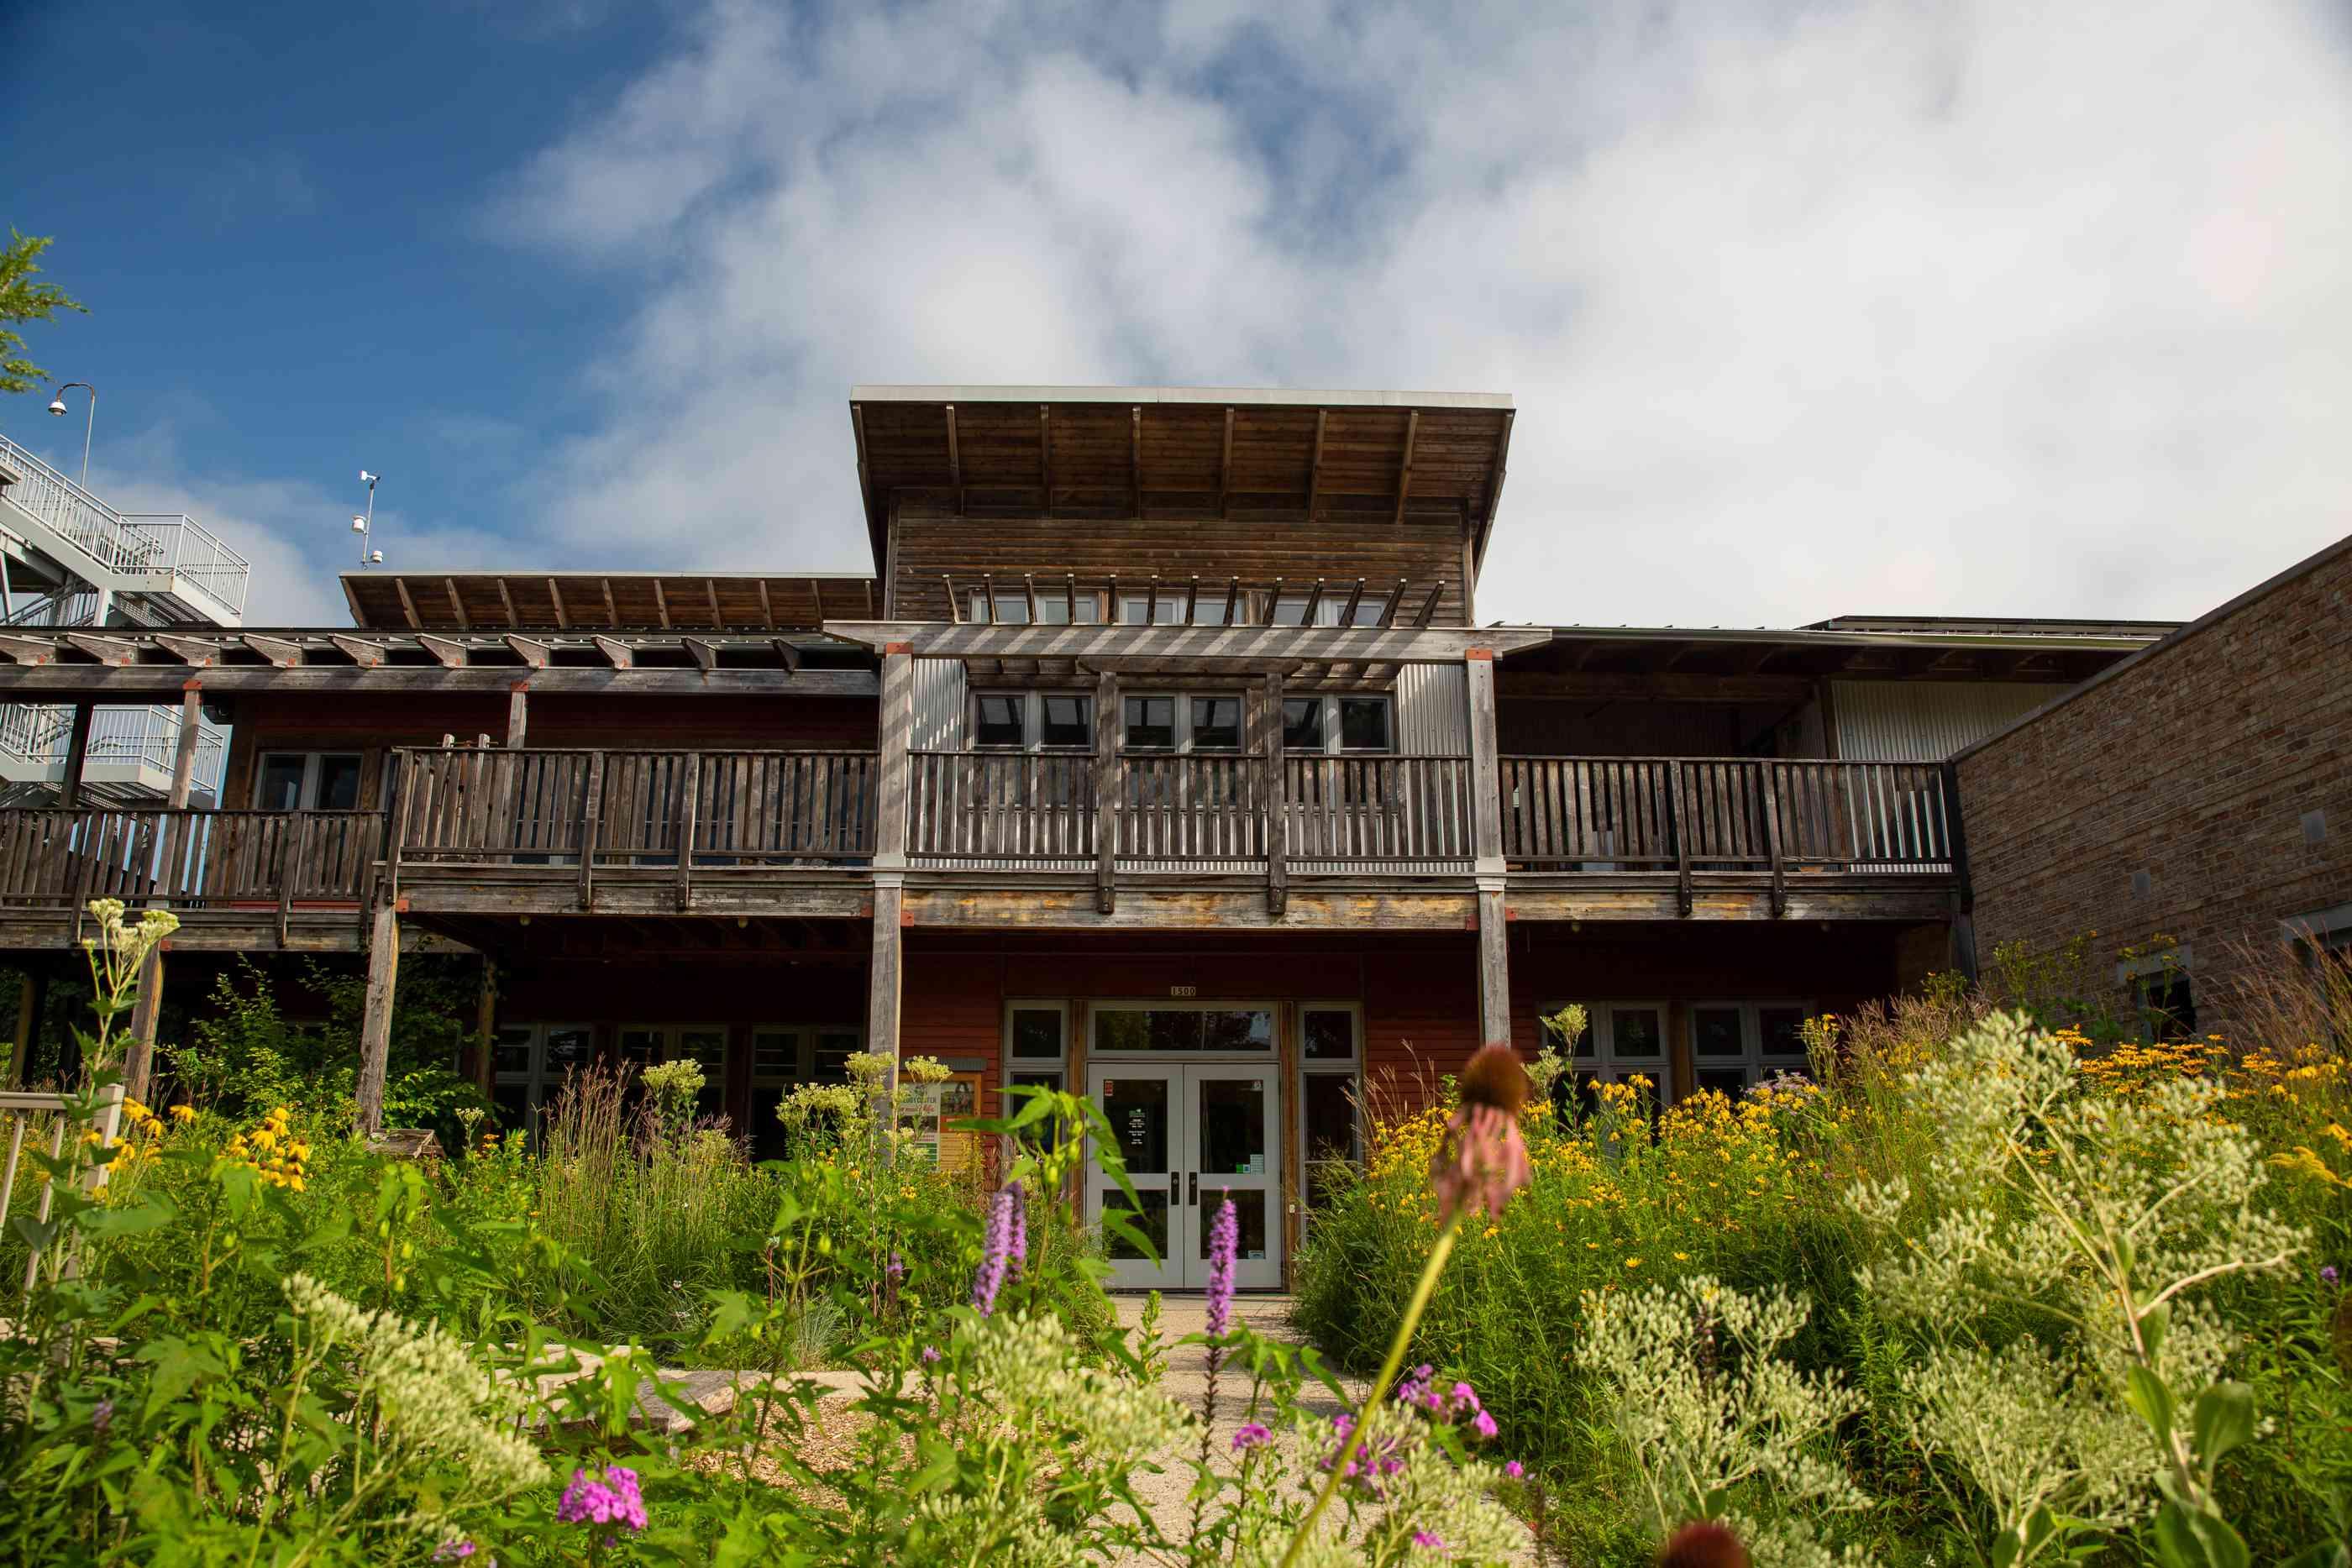 Exterior del Centro de Ecología Urbana con flores silvestres creciendo en frente